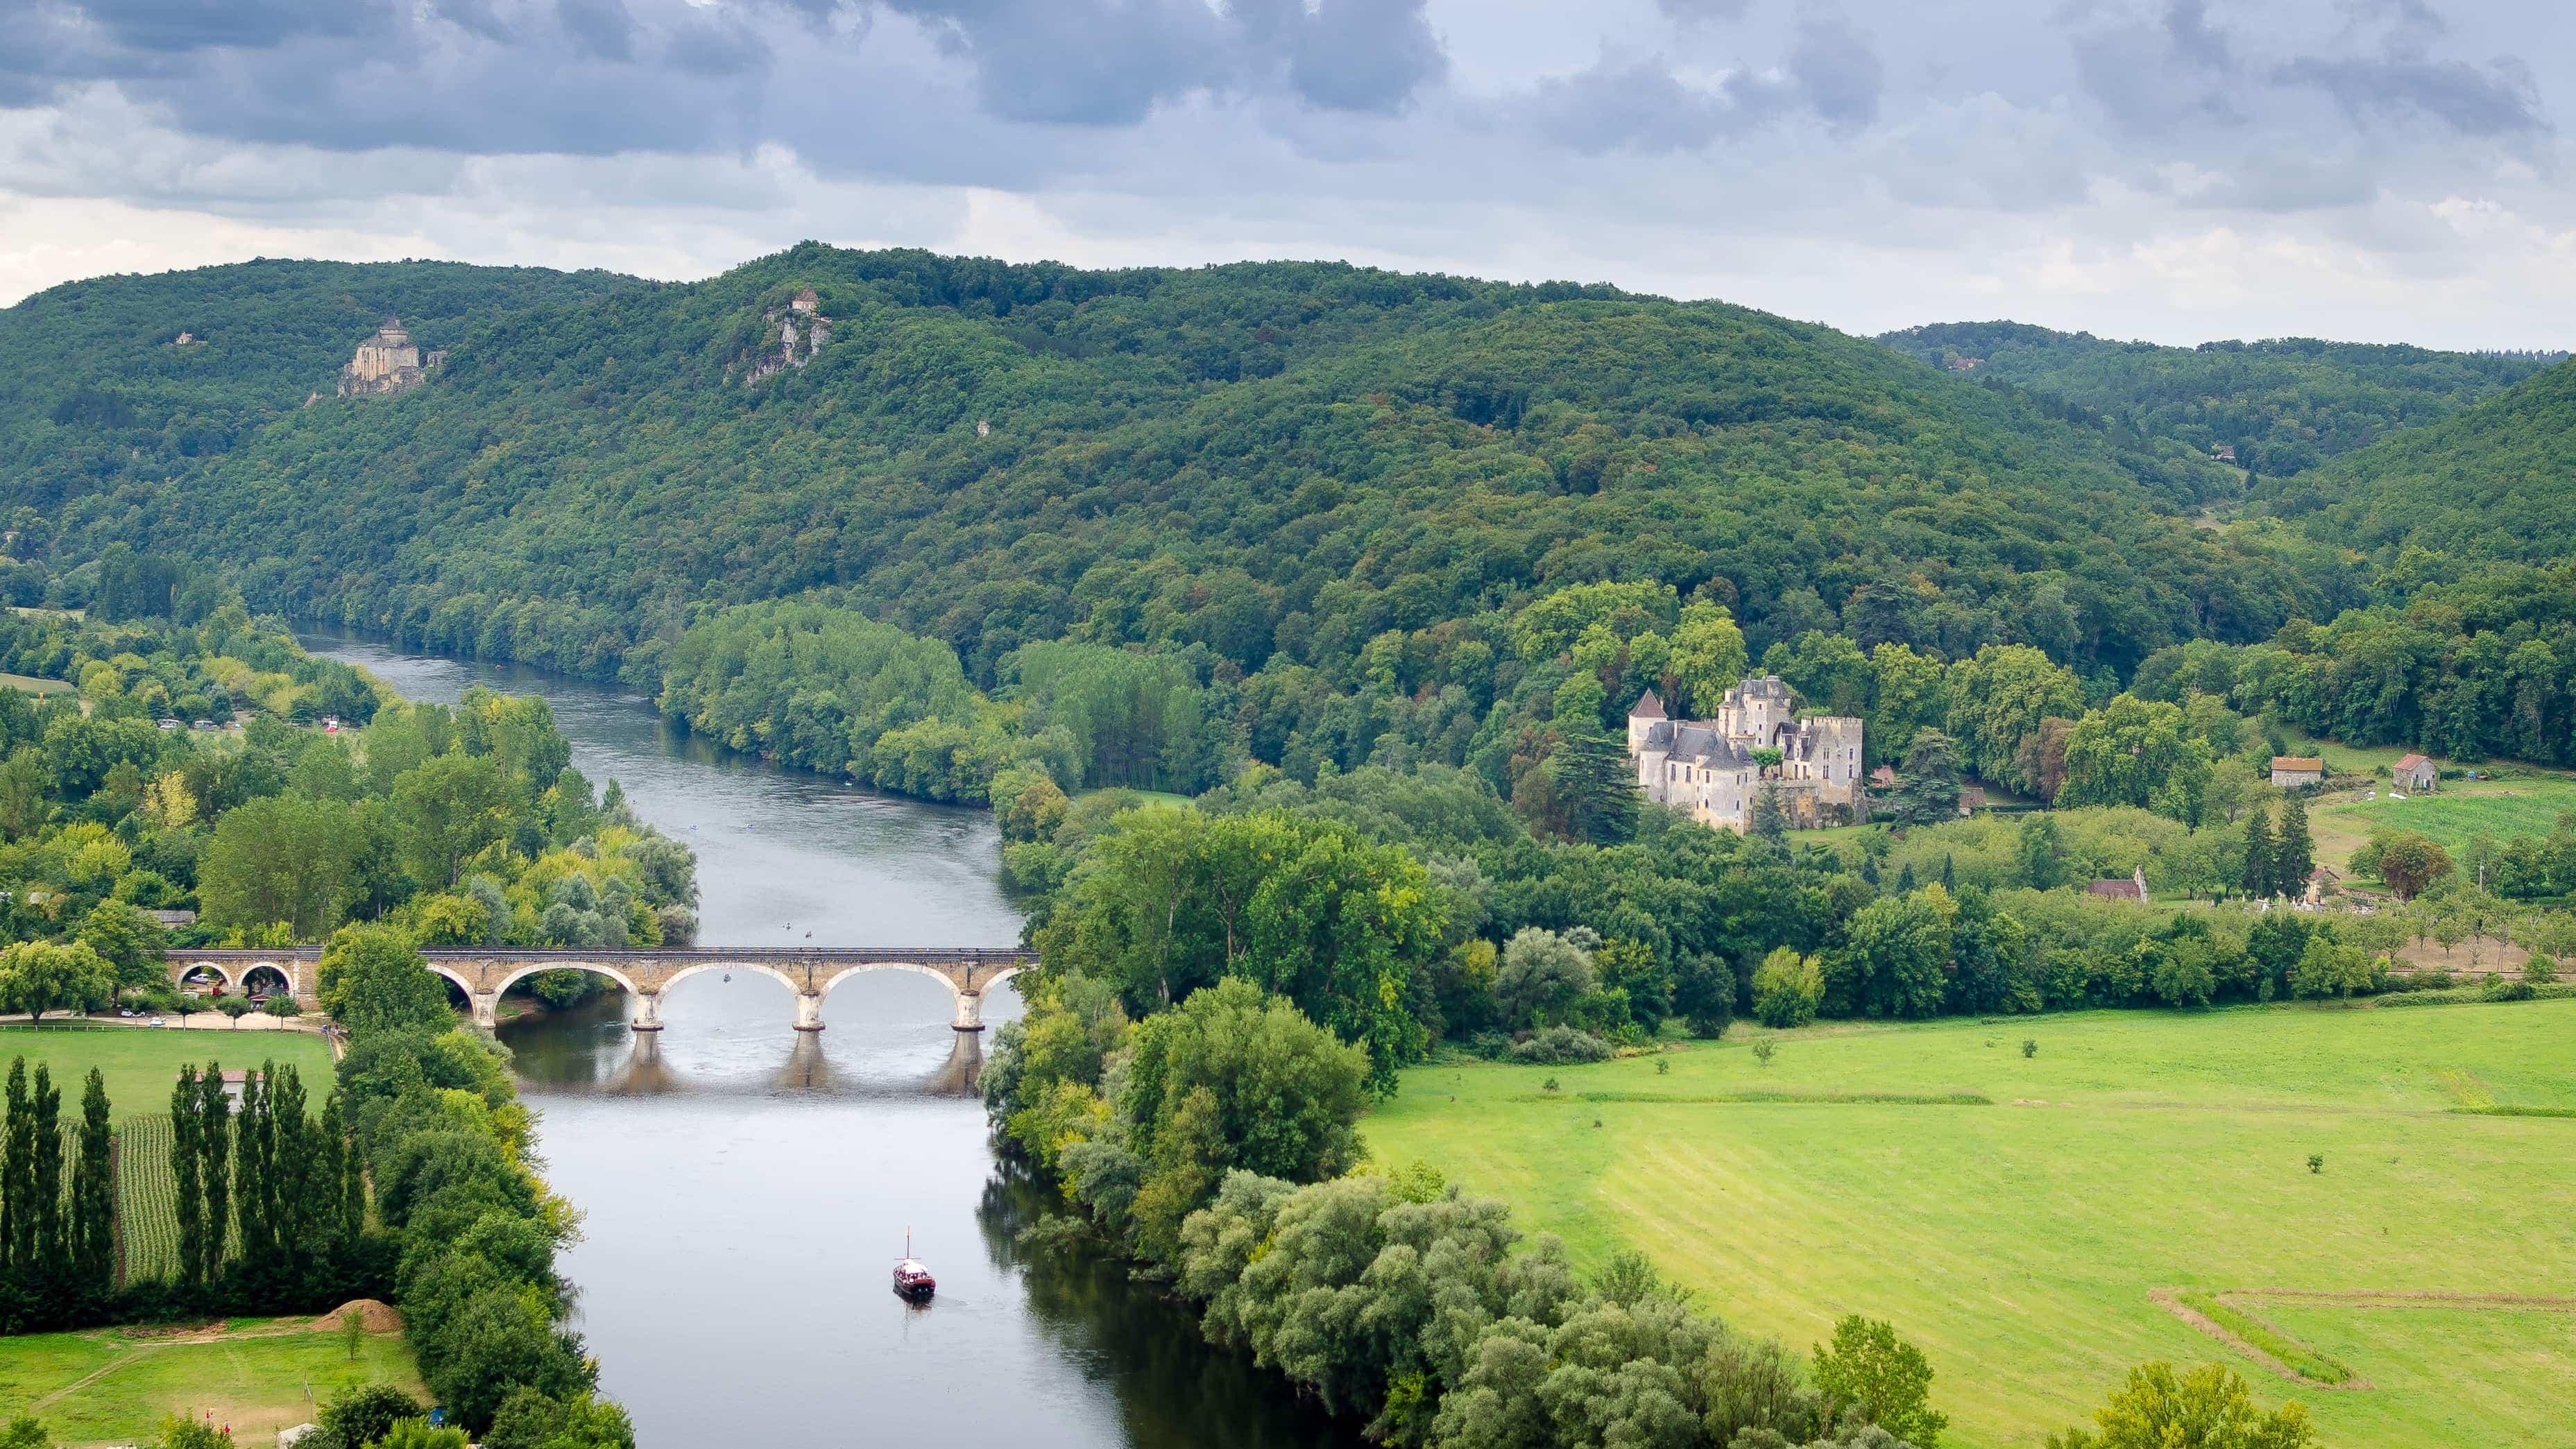 Dordogne River Valley - La Borie Gites Holiday Accommodation Dordogne Lot France